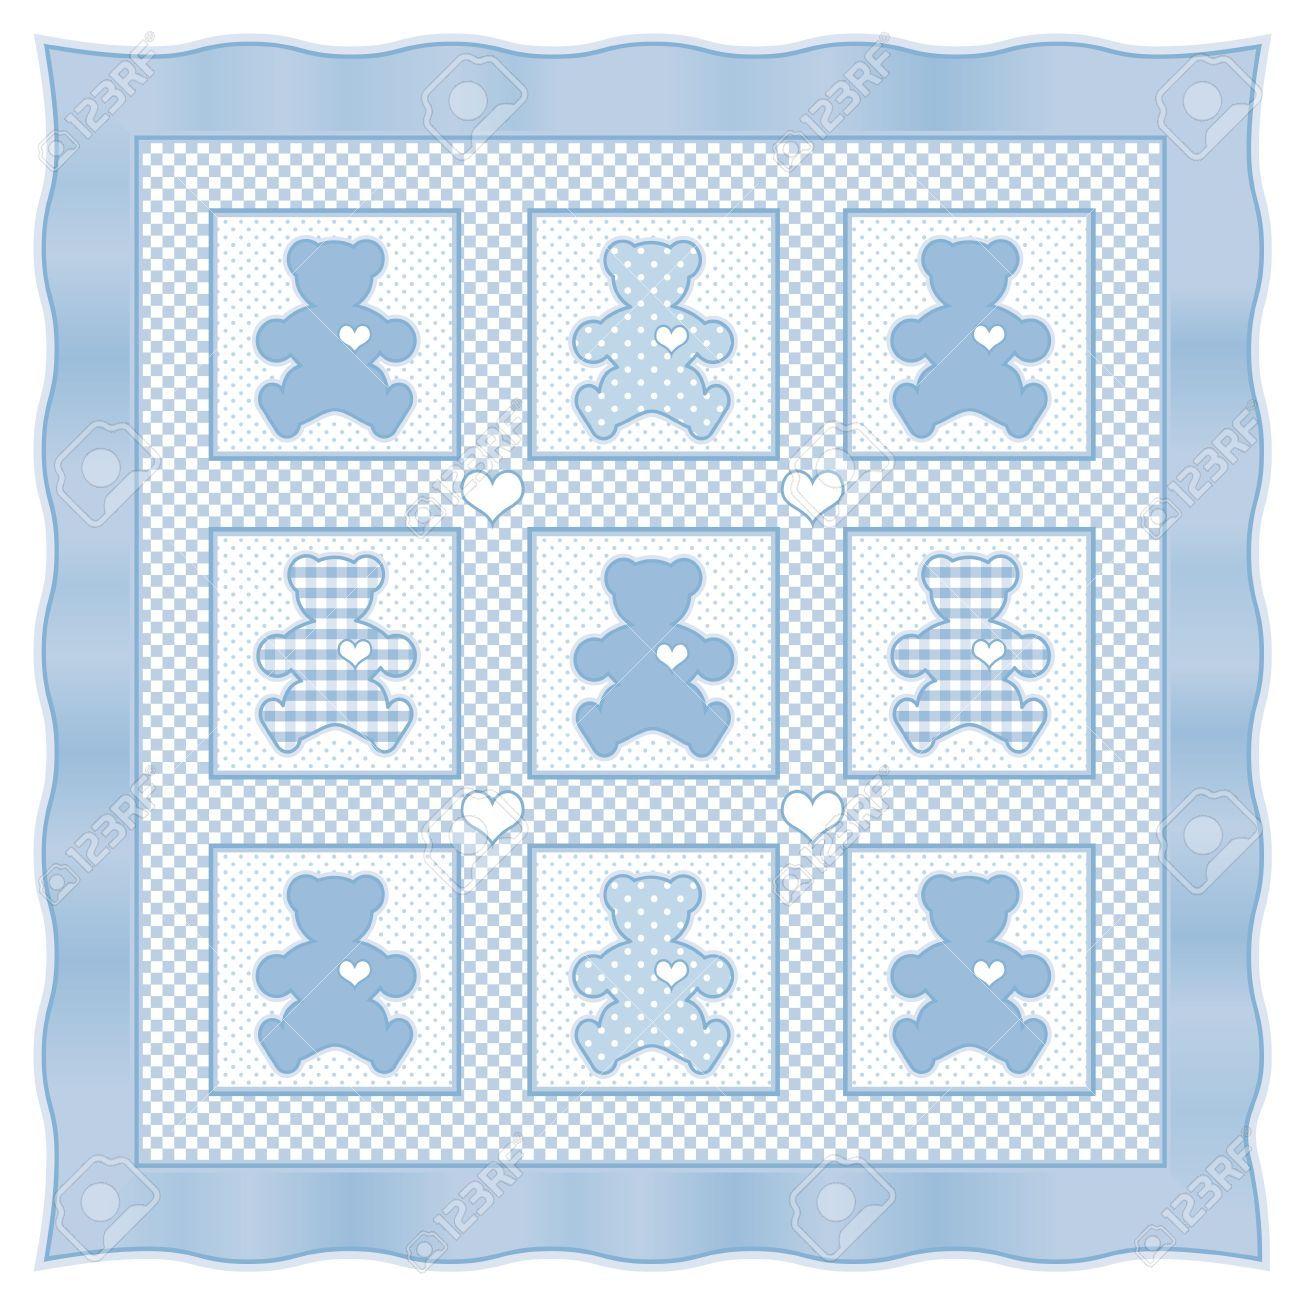 Teddy Bear Baby Quilt Vintage Pattern, Blue Pastel Gingham, Polka ... : blue baby quilt - Adamdwight.com